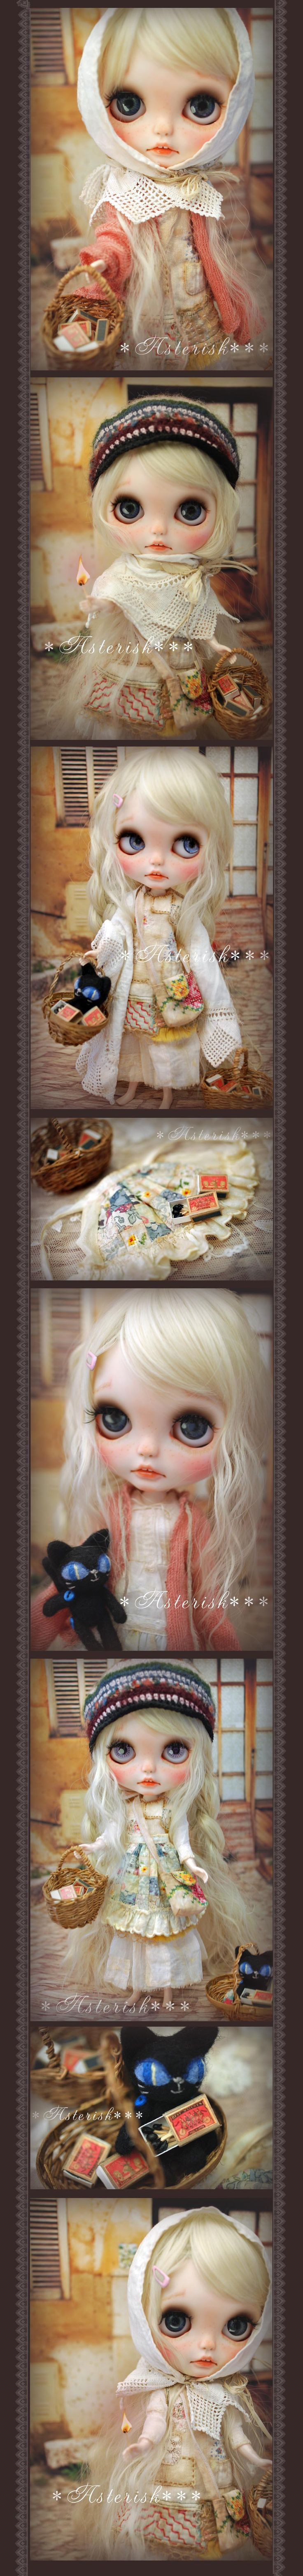 * Custom Blythe The Little Match Girl -Asterisk *** - Auction - Rinkya! Japan Auction & Shopping